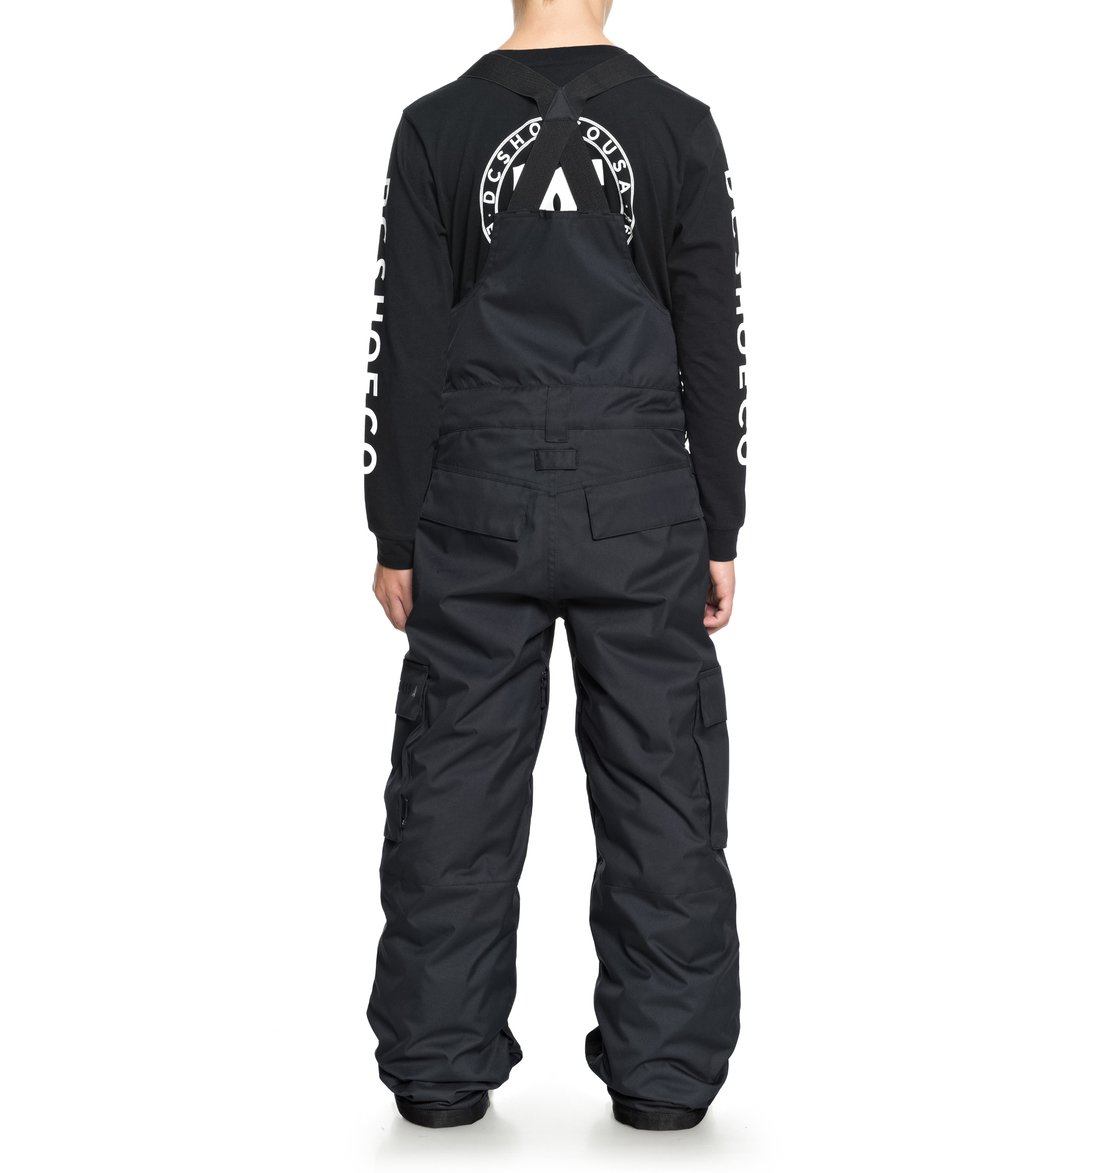 DC-Shoes-Banshee-Snow-Bib-Pants-for-Boys-8-16-Schneelatzhose-Jungen-8-16